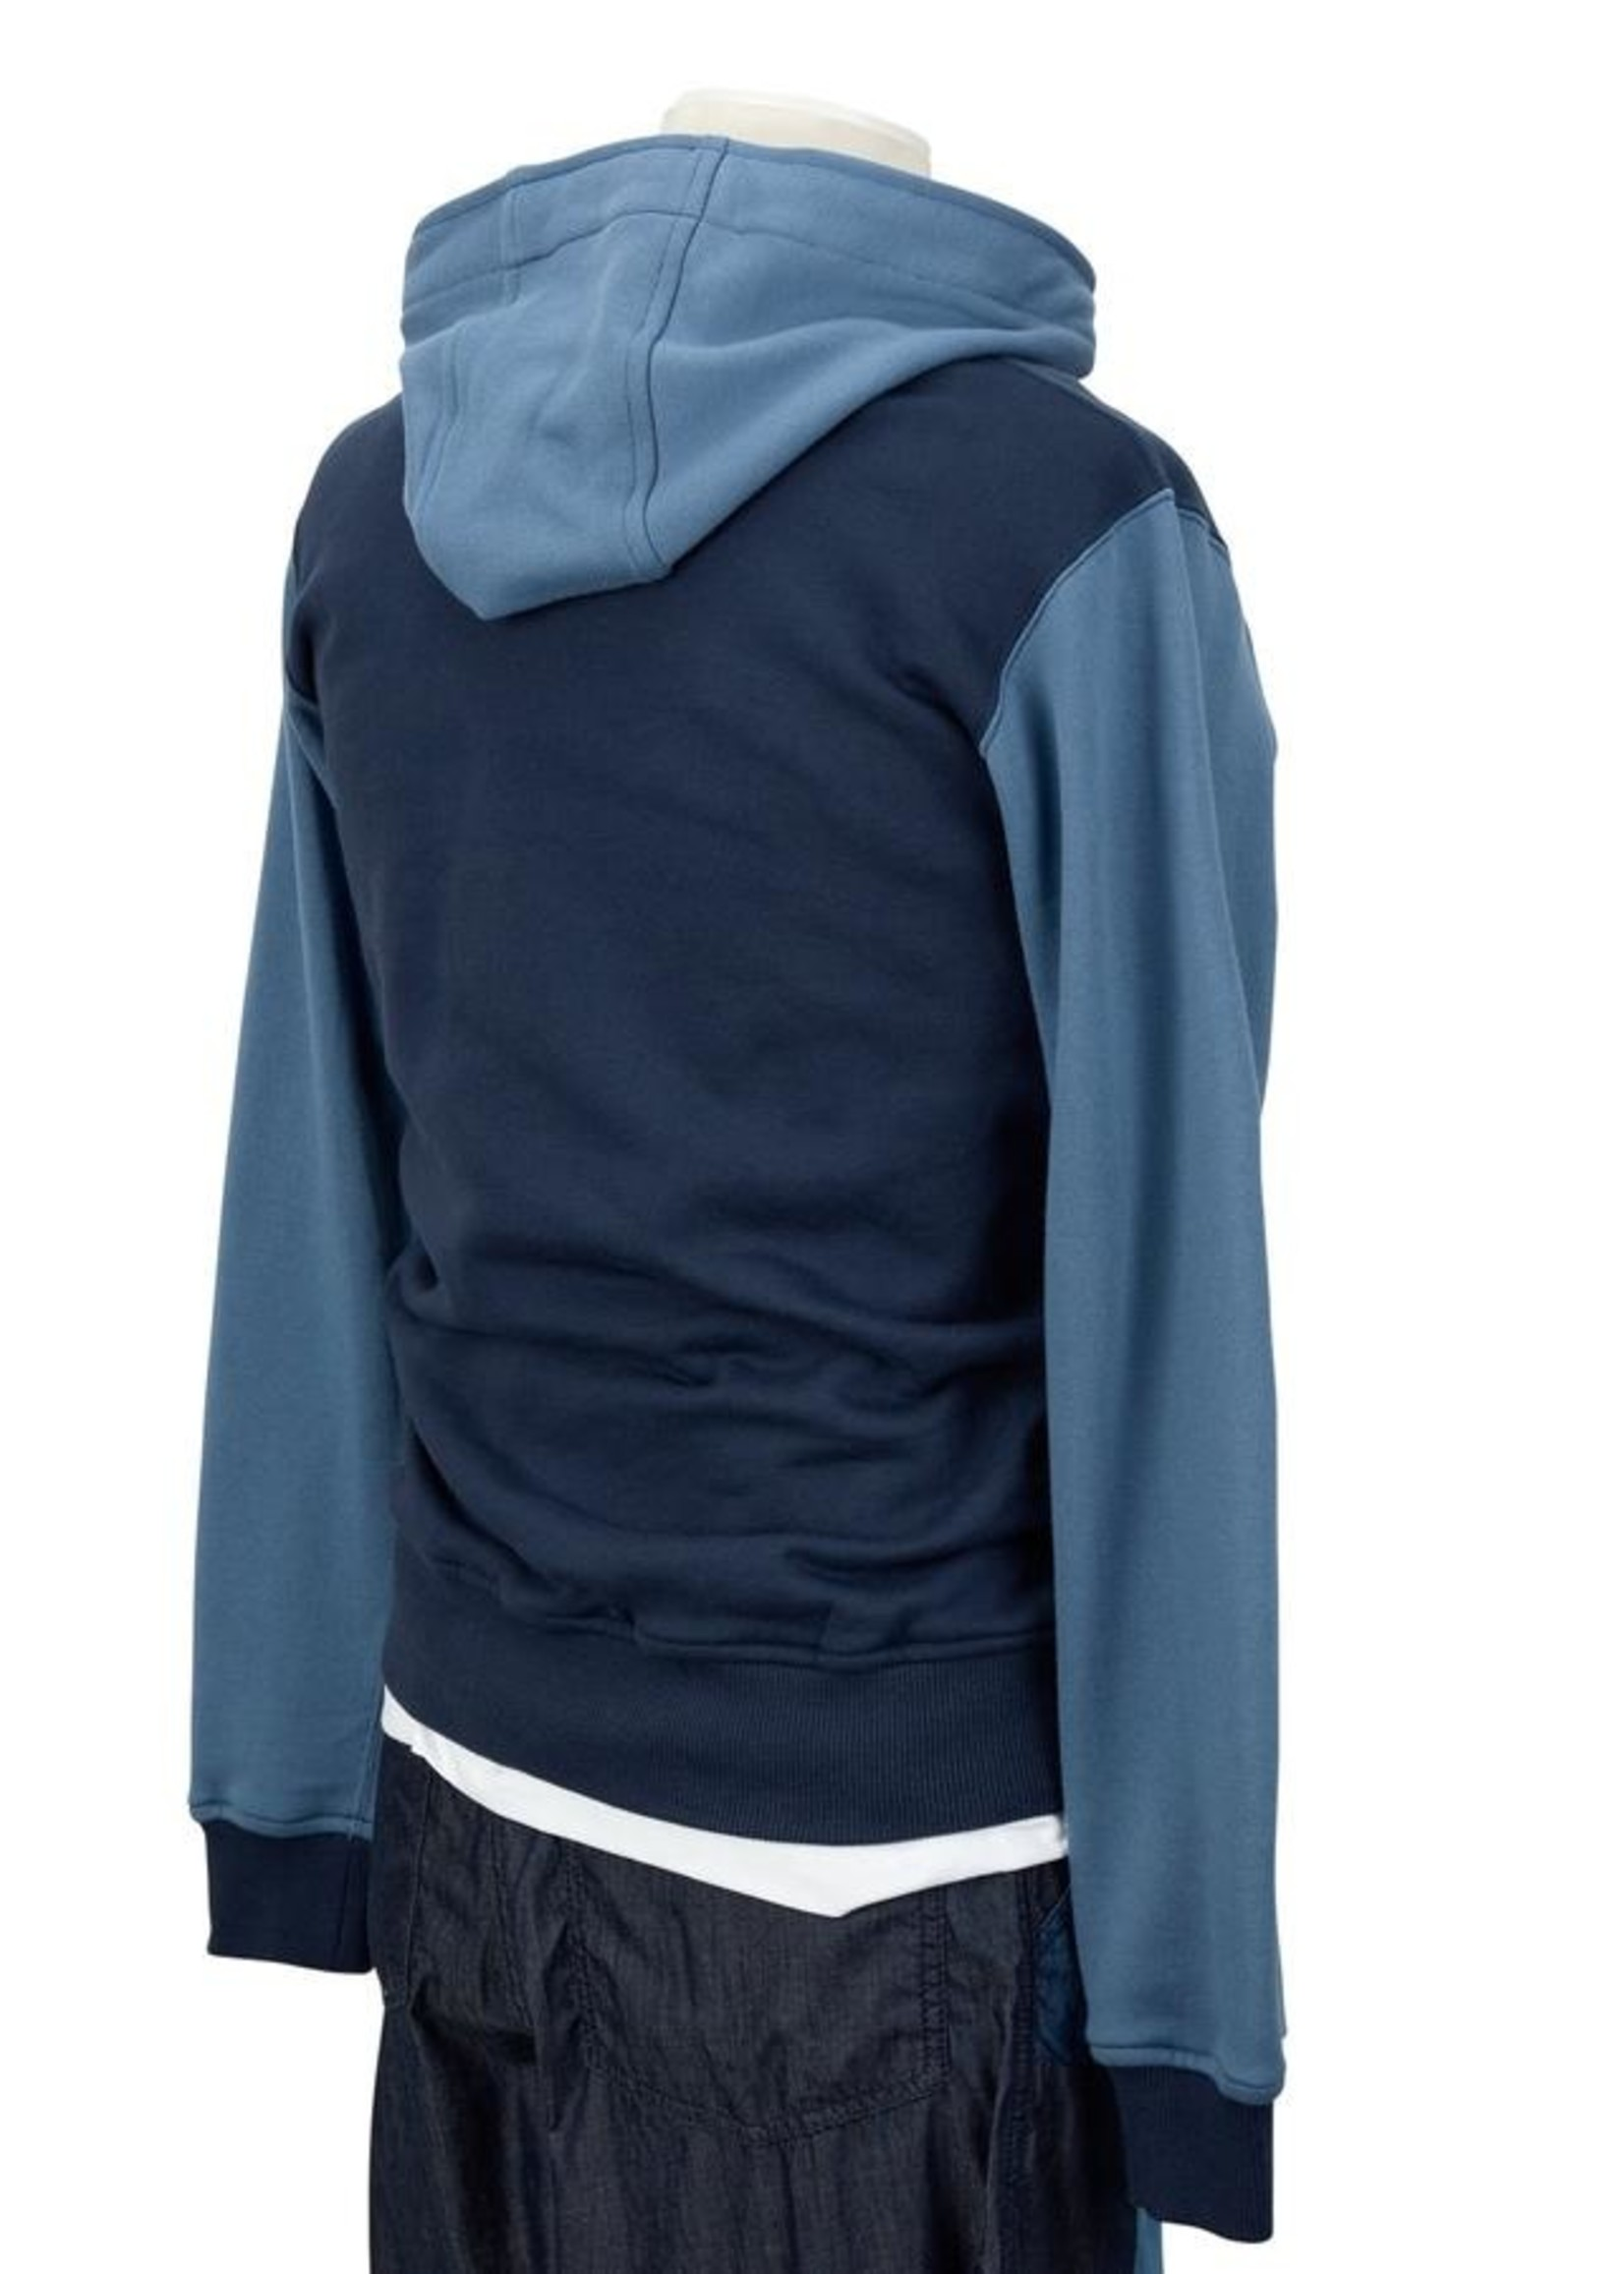 COMME des GARÇONS SHIRT Color Block Hooded Sweatshirt in Blue